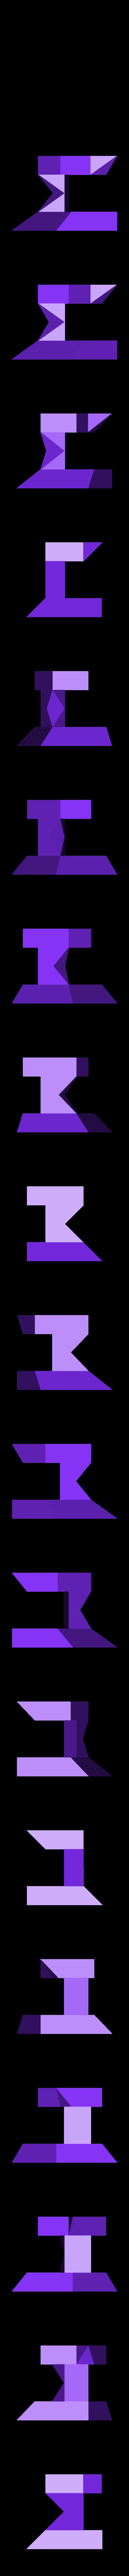 slidewayscube.STL Download free STL file Slideways Cube • Model to 3D print, 3dcave